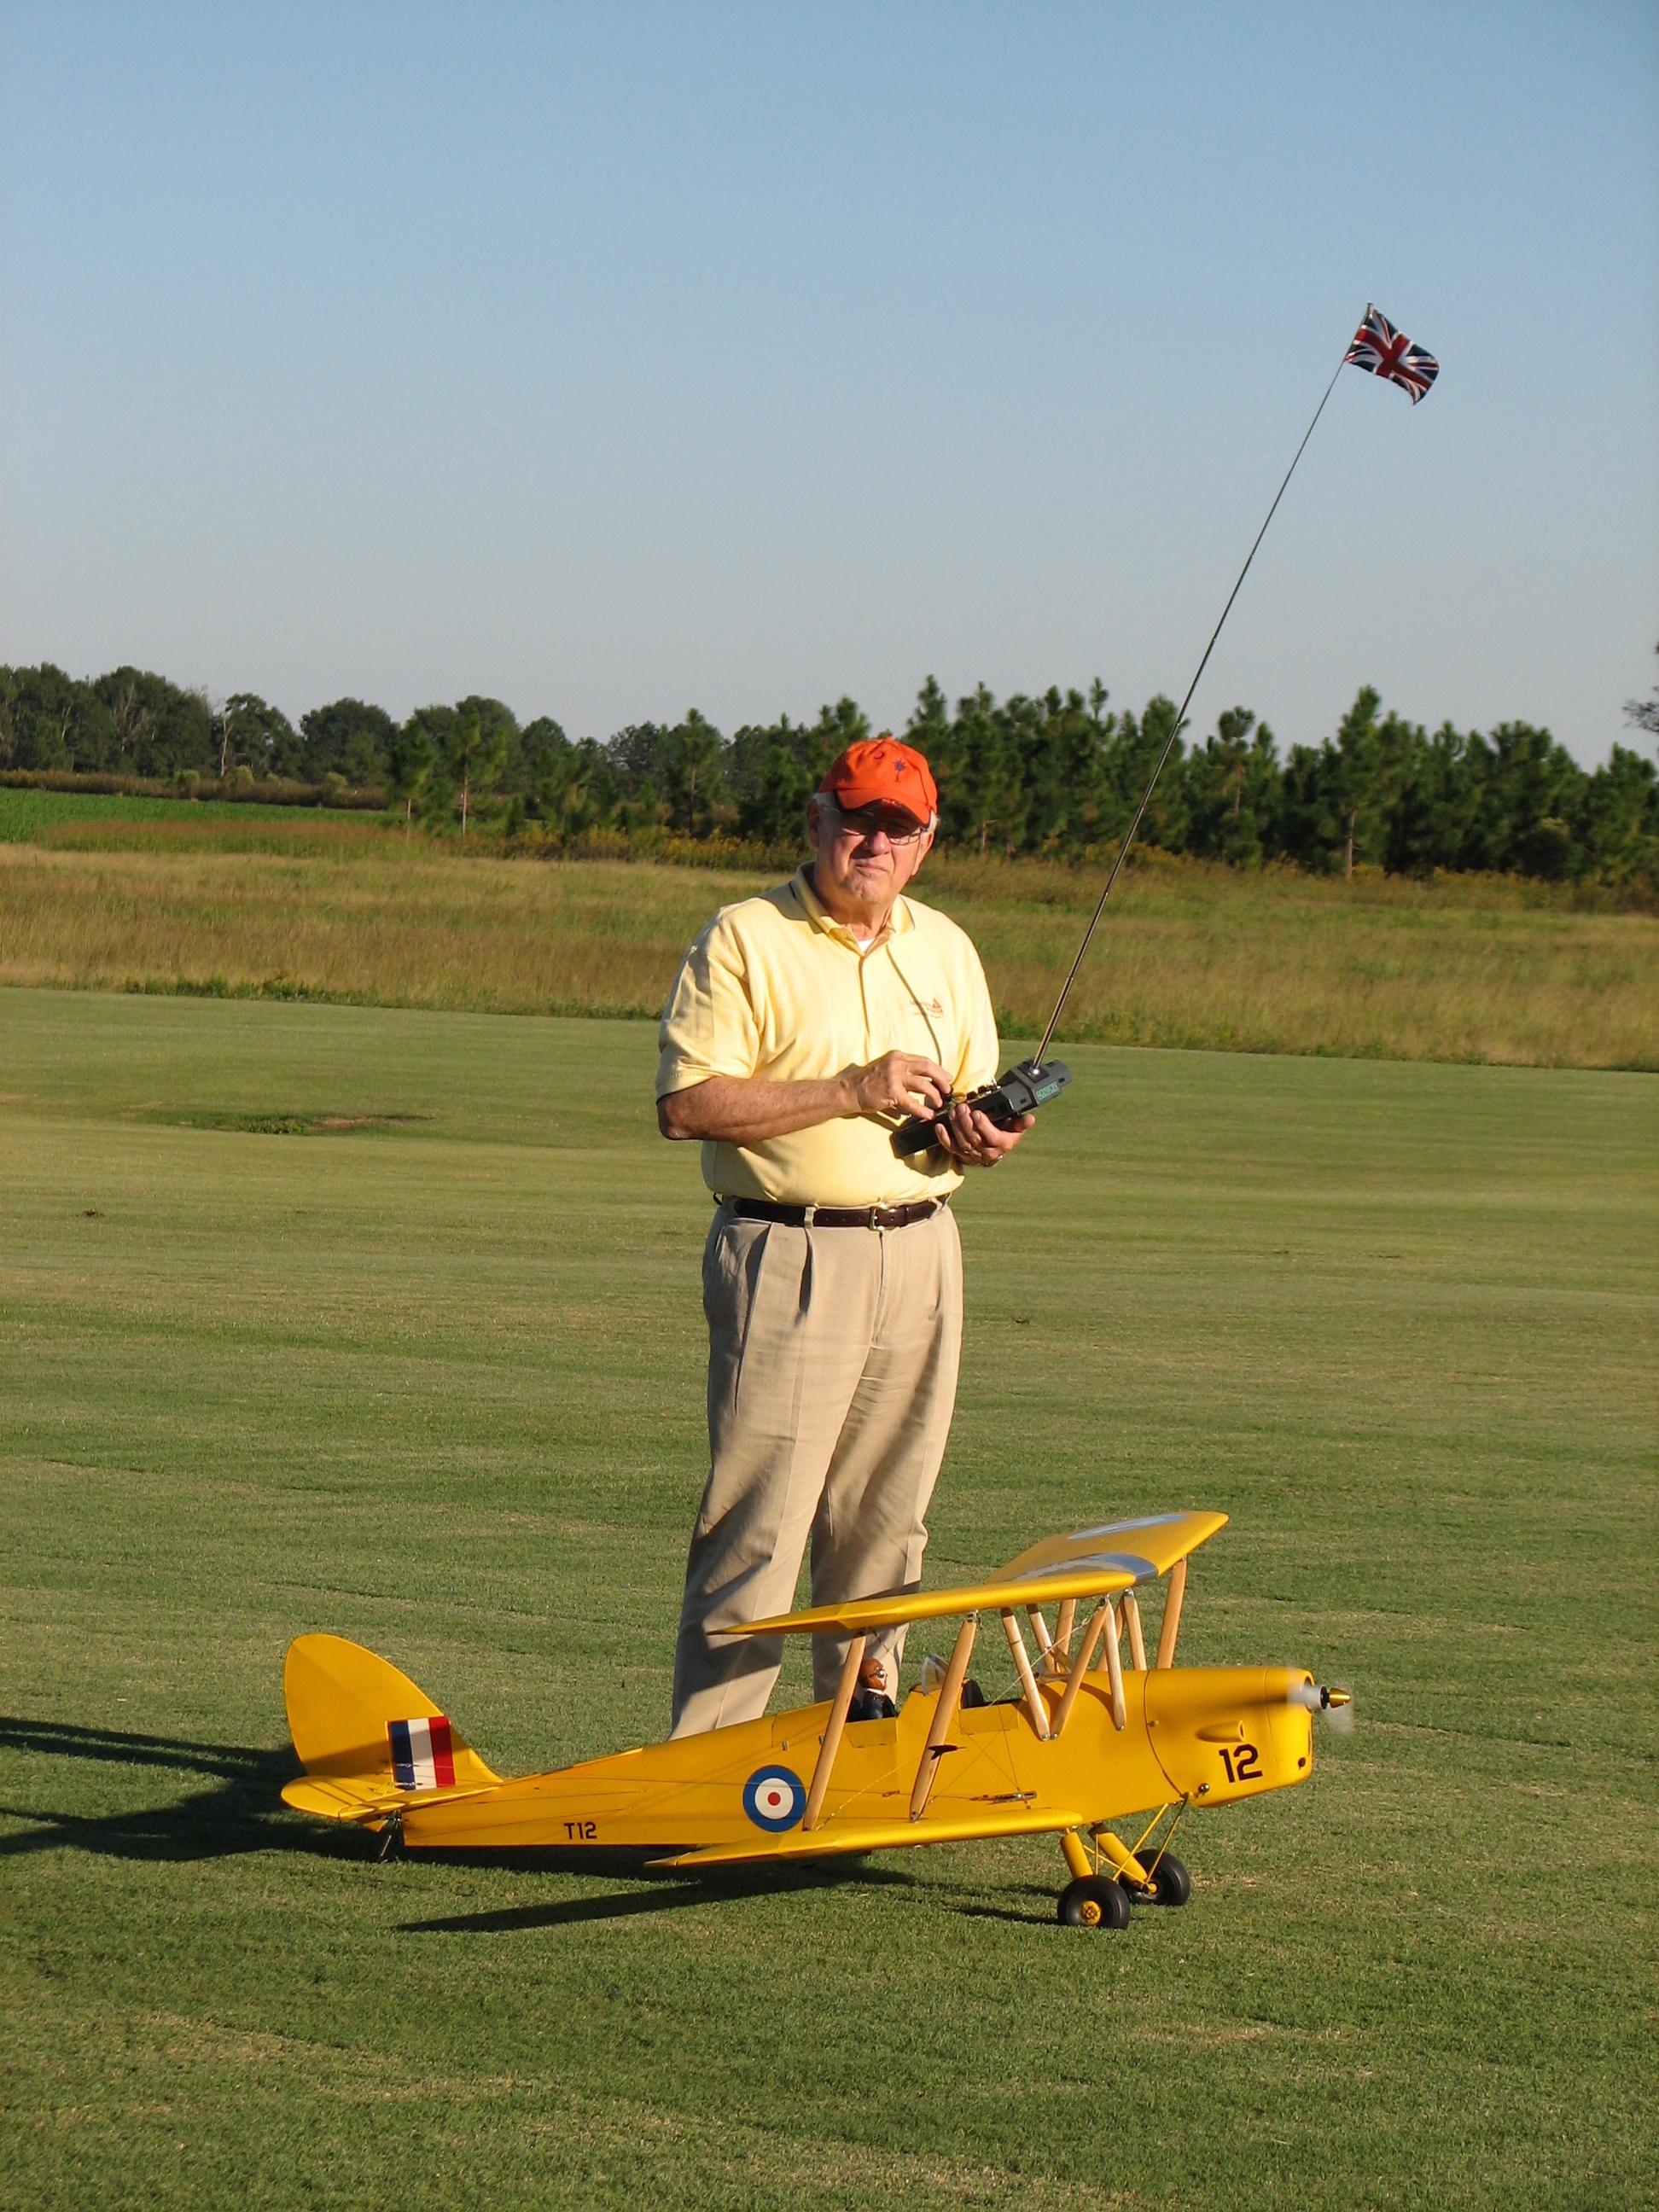 Click image for larger version.  Name:Tiger Moth at Macks.jpg Views:13 Size:2.19 MB ID:2028855